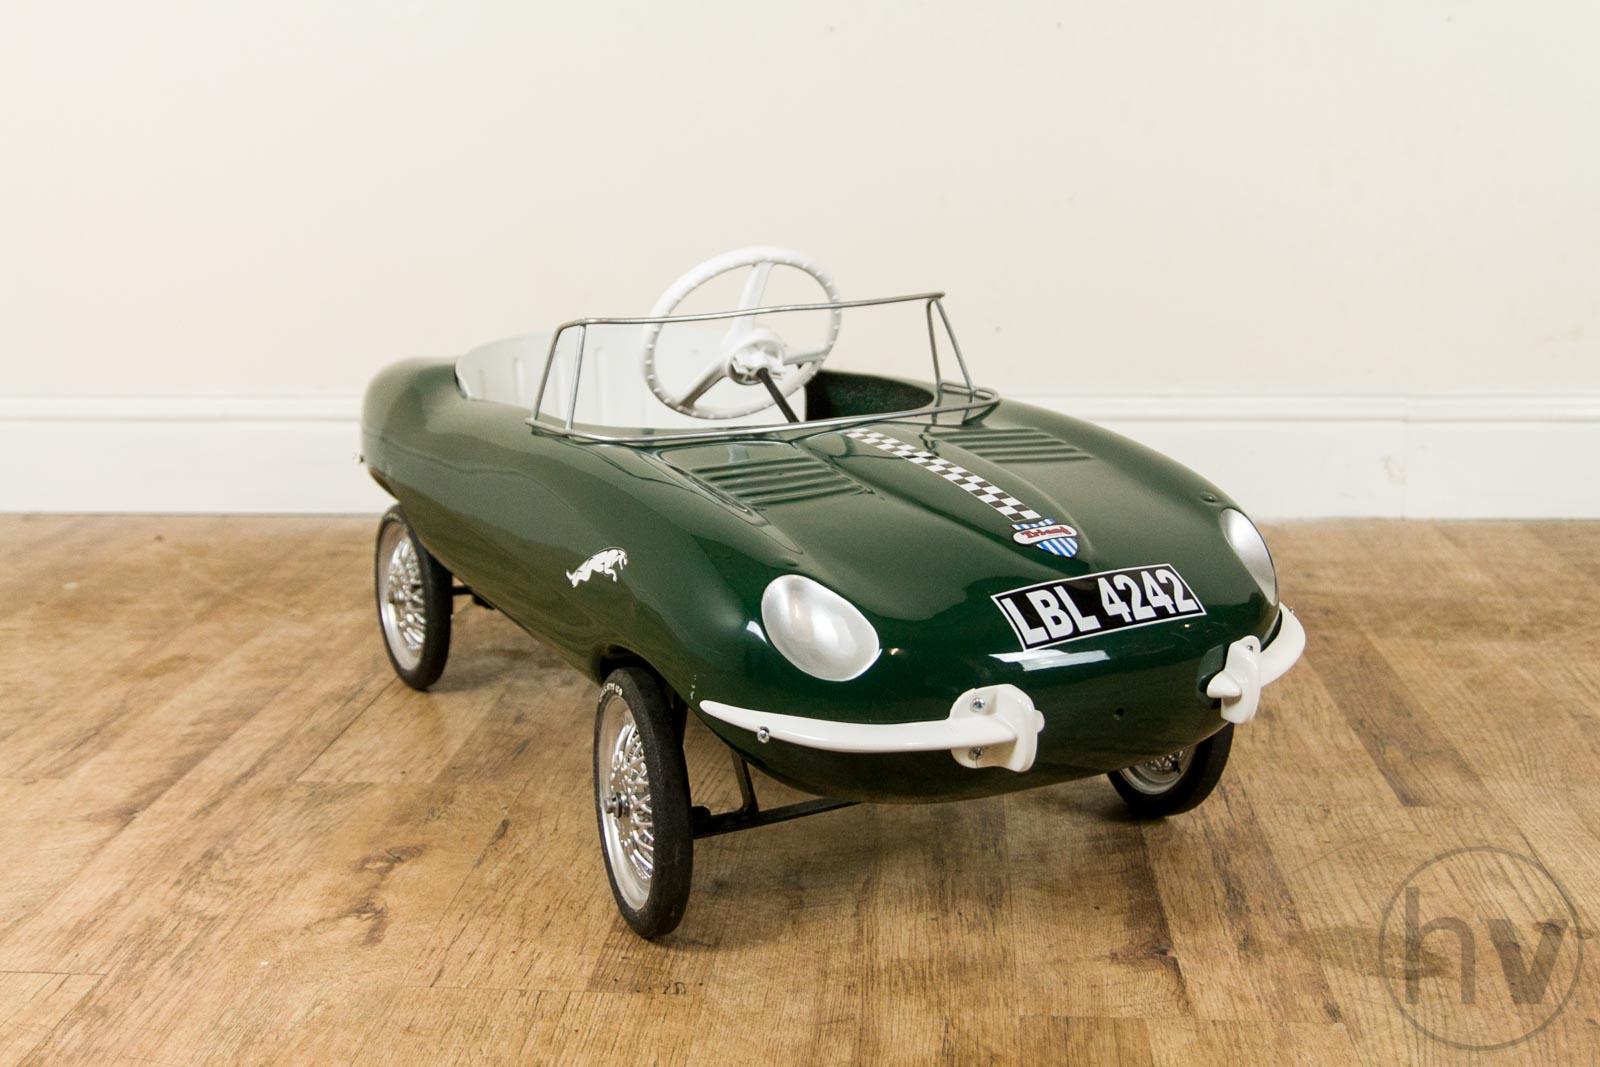 Excellent Classic Cars Uk Ebay Photos - Classic Cars Ideas - boiq.info